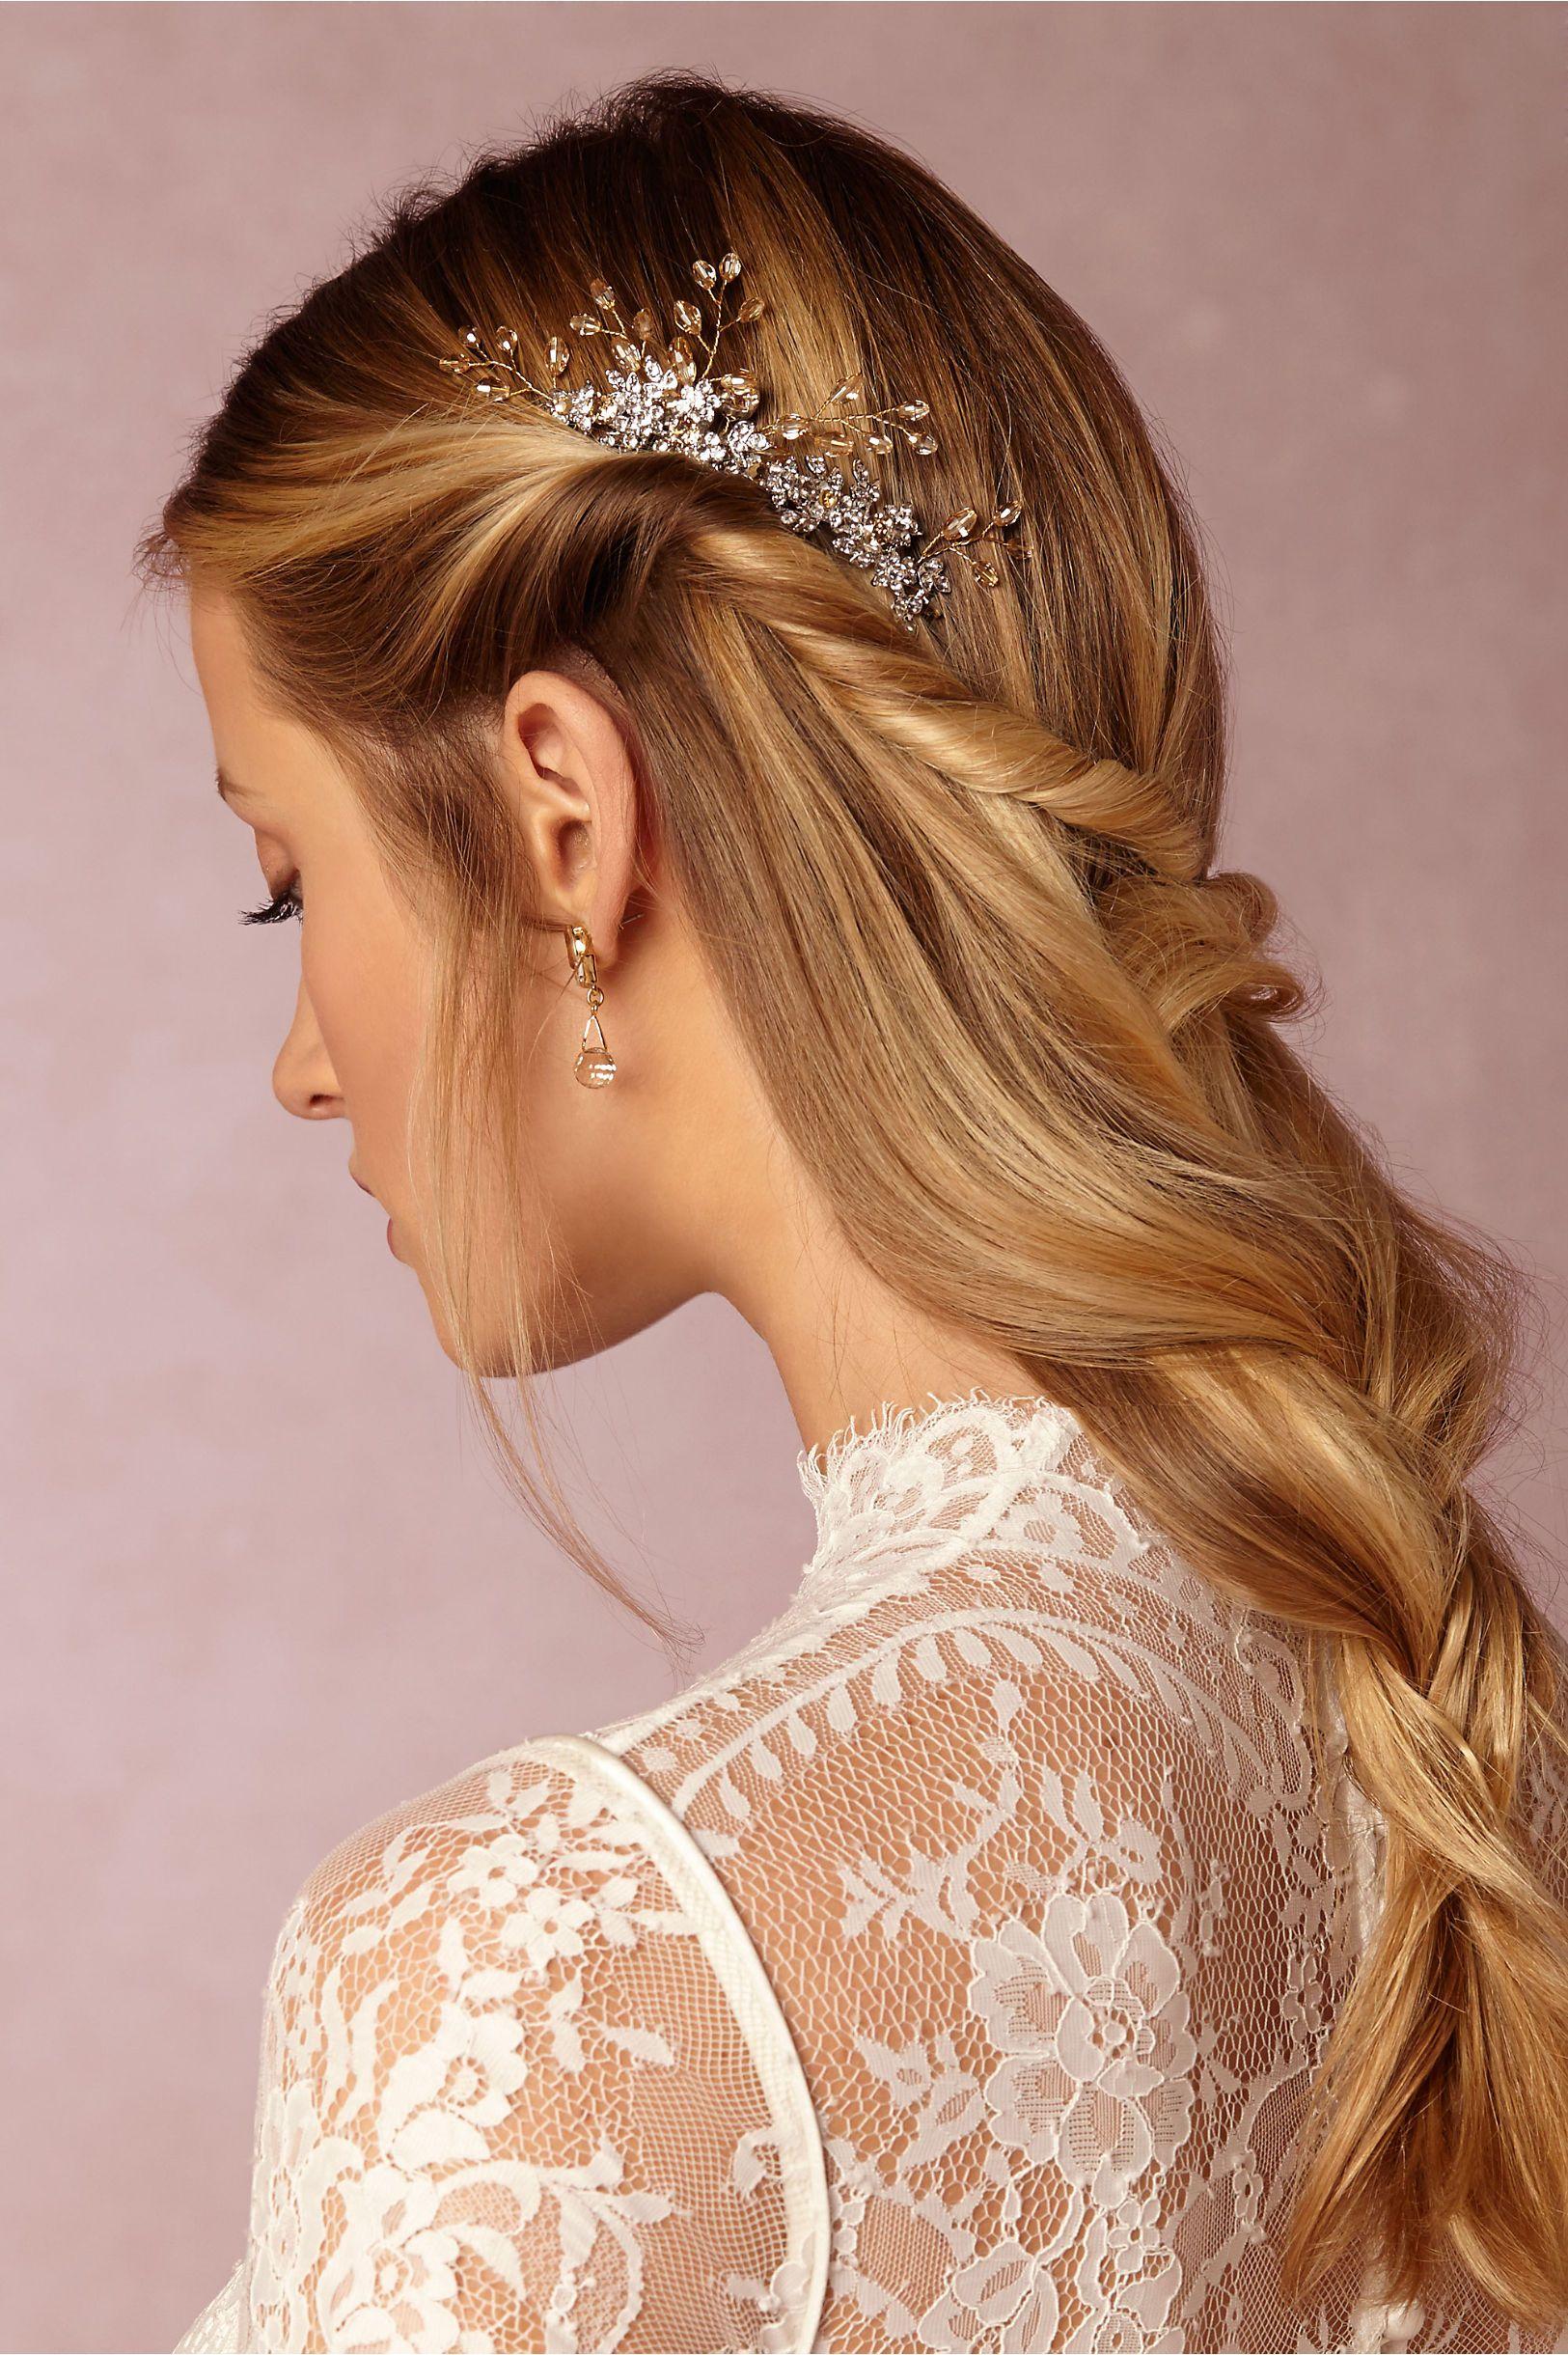 Cork Pop Comb Wedding Hair And Makeup Vintage Hair Clips Bridal Hair Comb